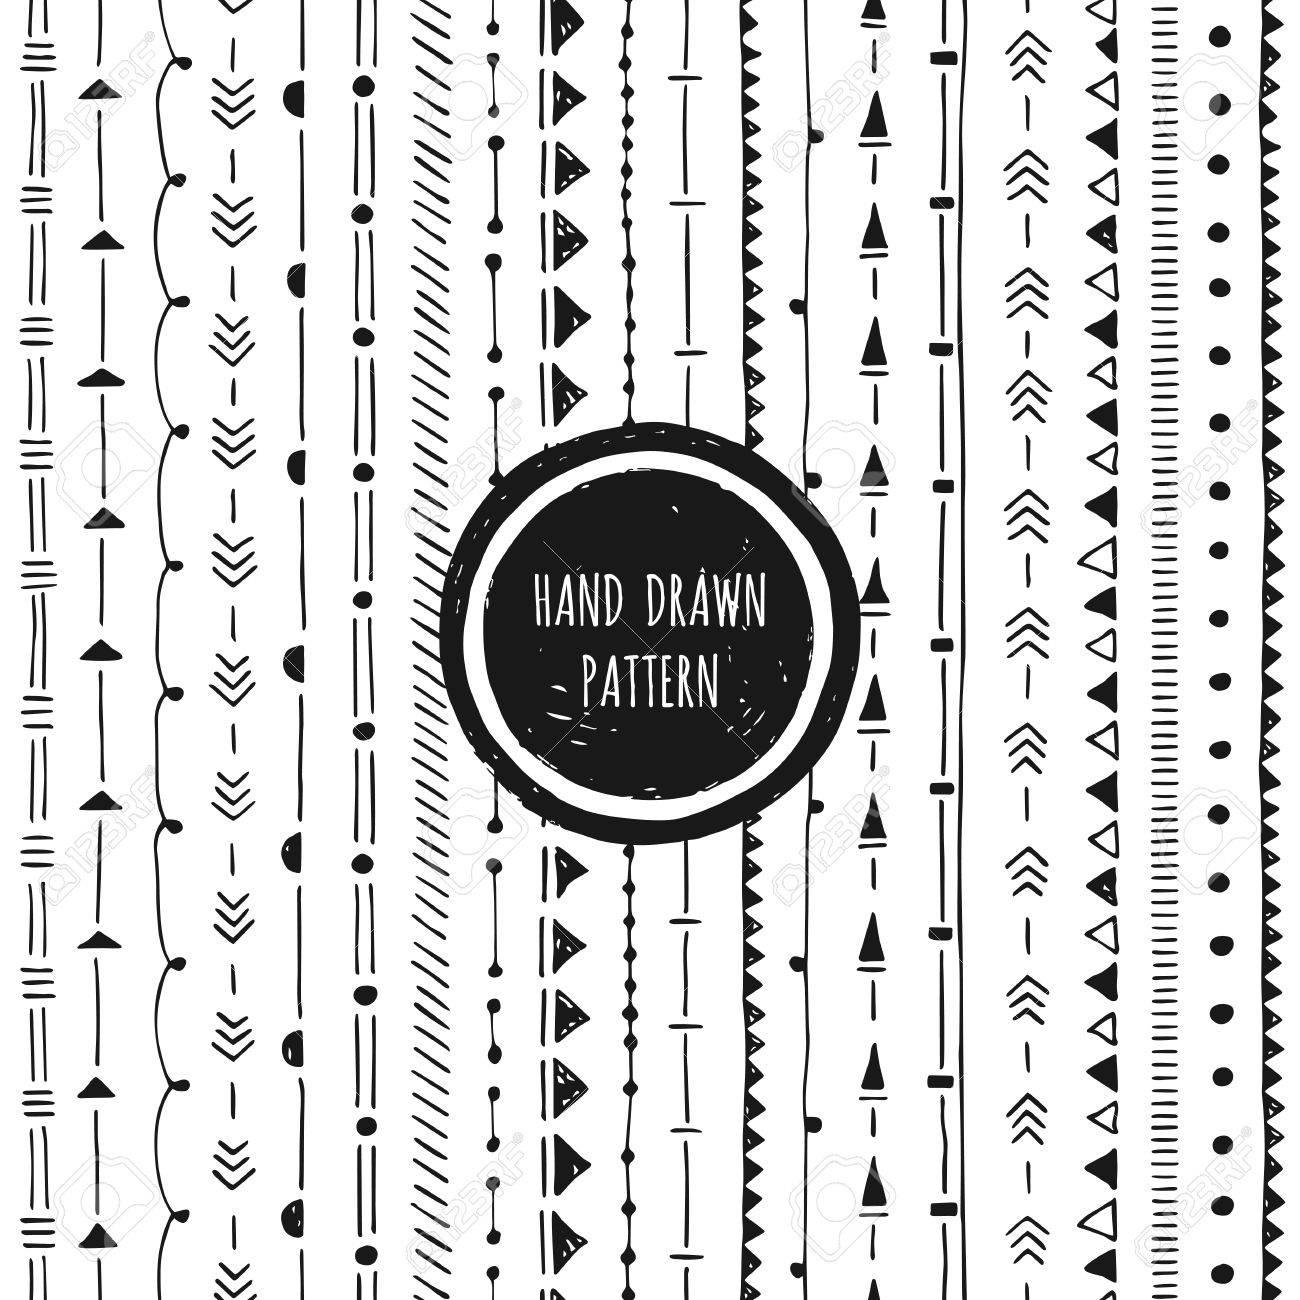 Black and white geometric pattern. Hand drawn seamless background. Round frame. - 62855051